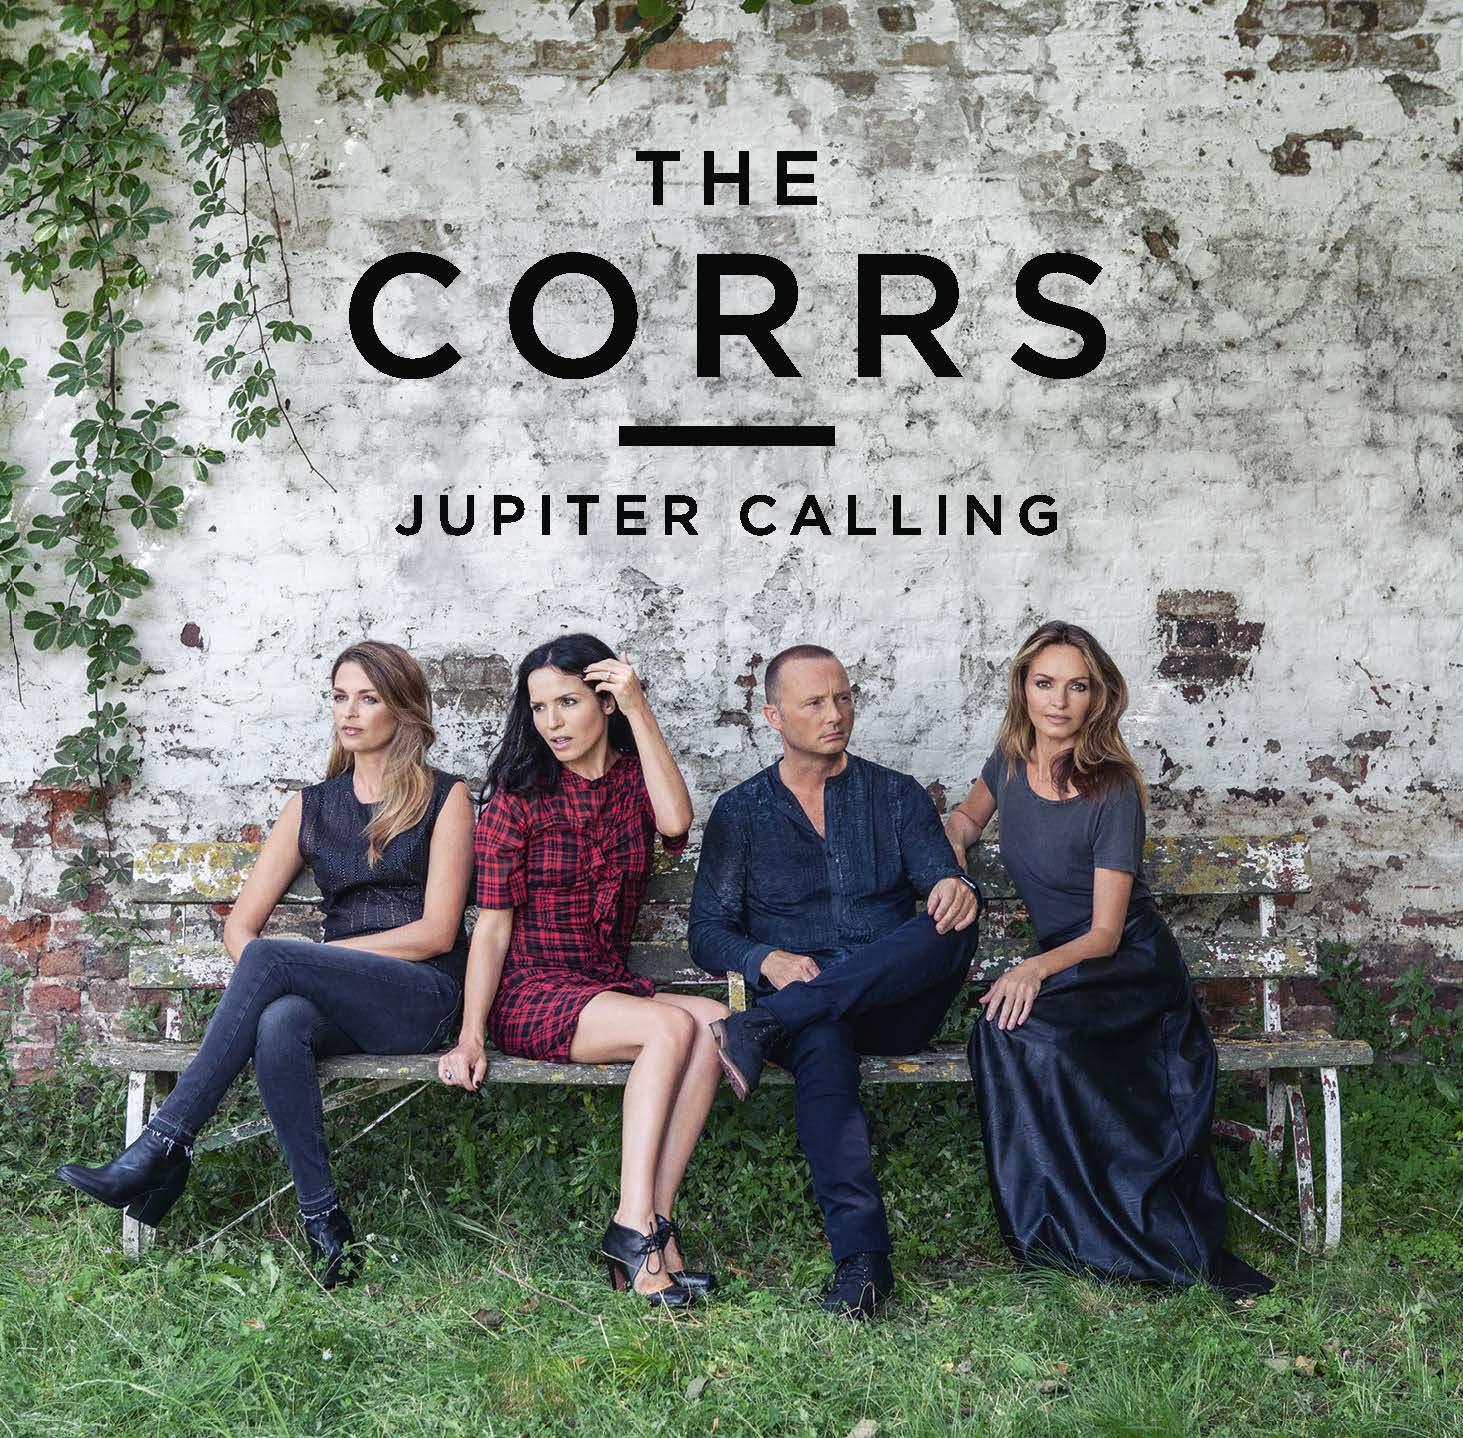 Jupiter Calling (2017) CD Album by The Corrs (includes mp3 version) £3.08 / £6.07 non prime @ Amazon